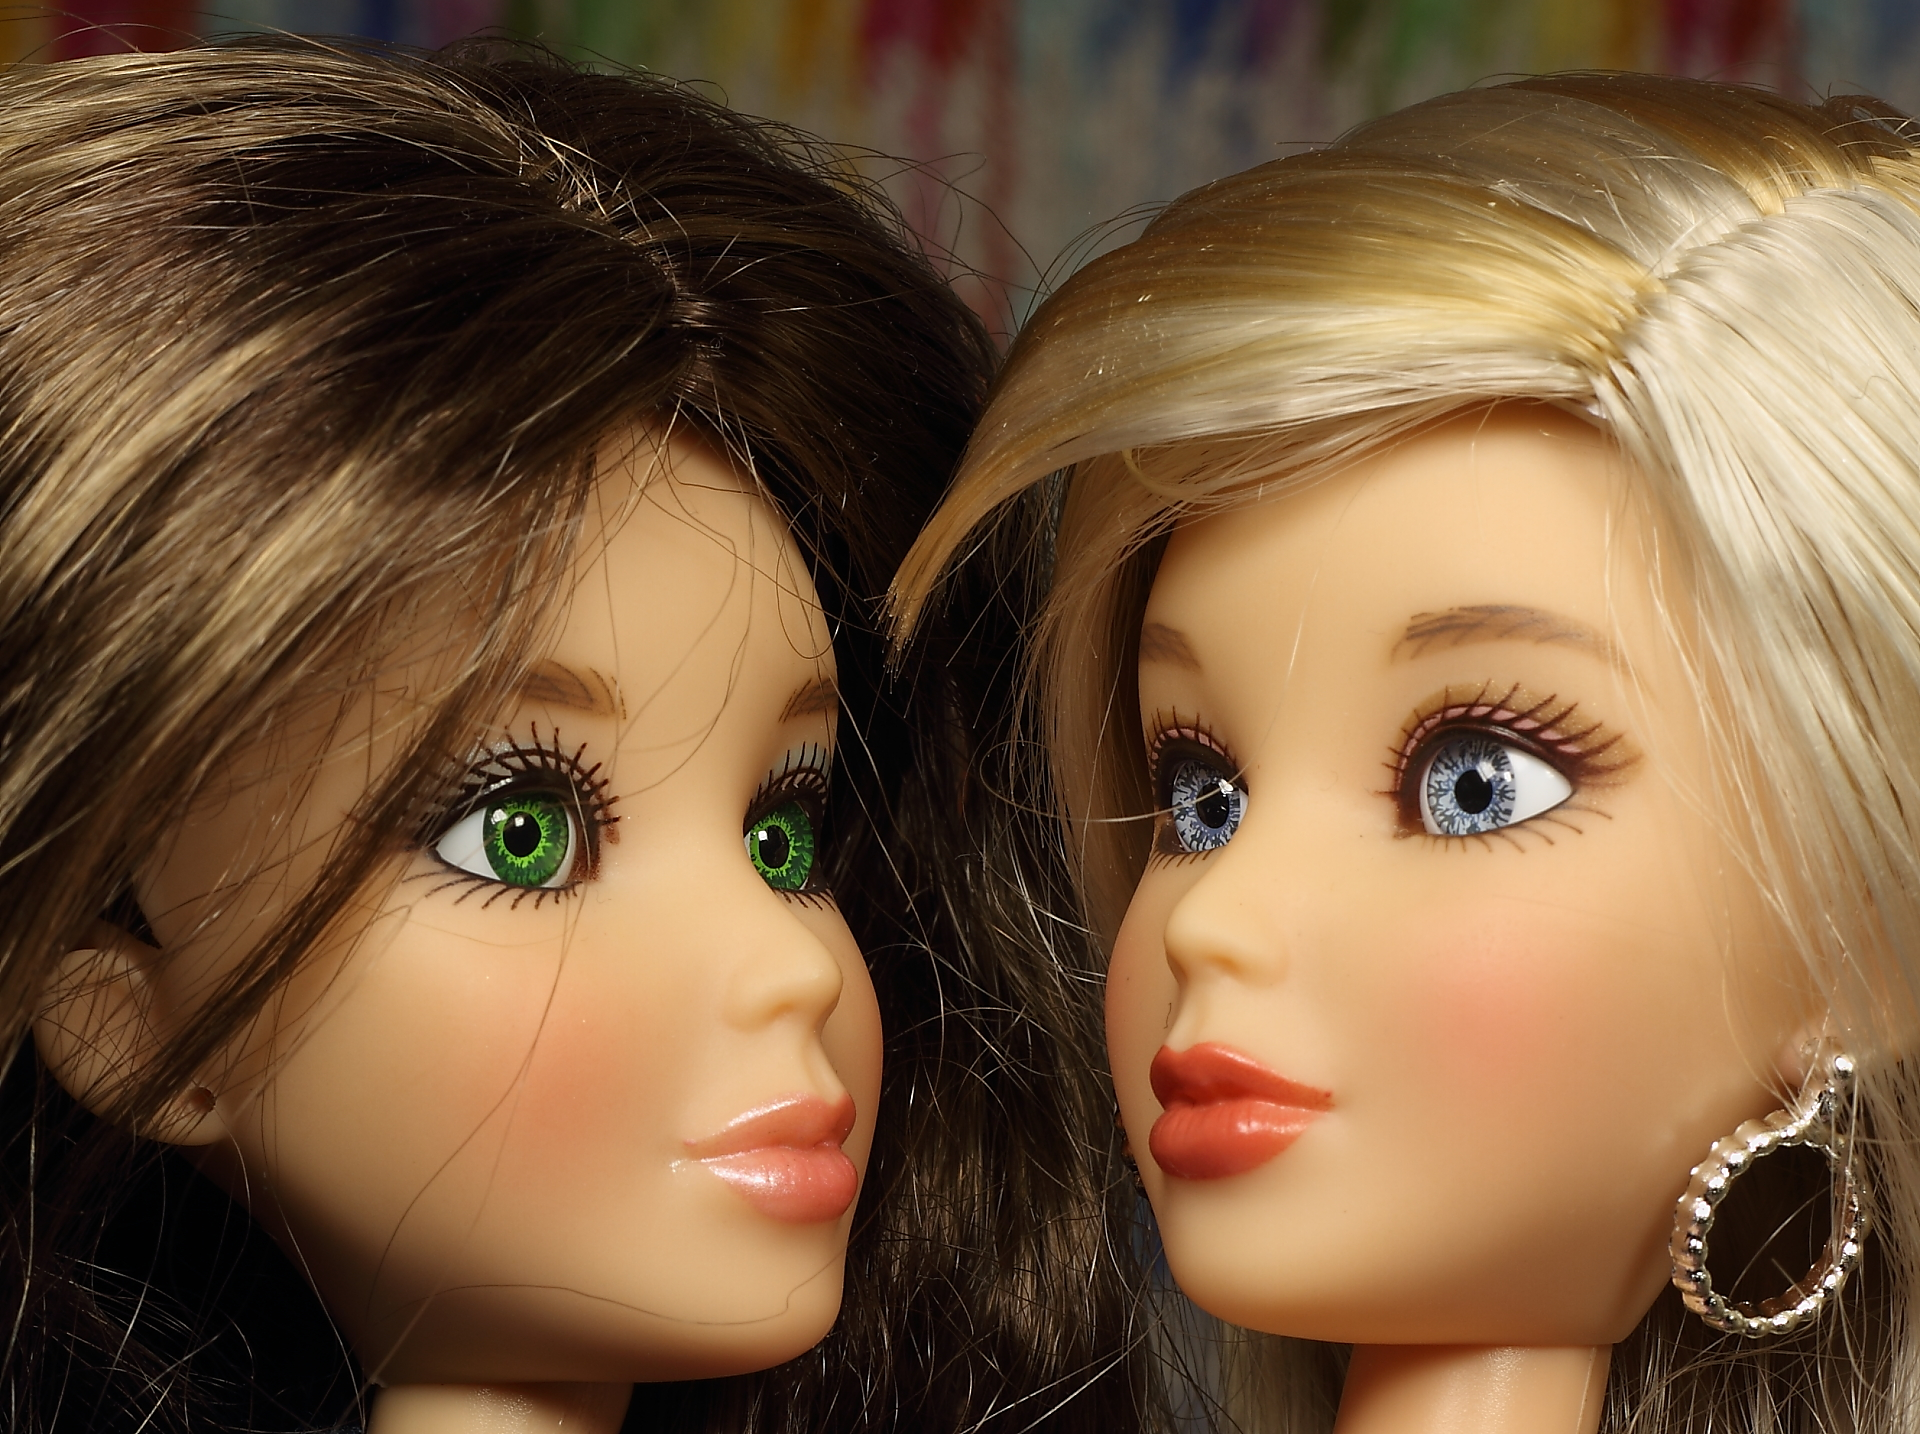 Блондинка и брюнетка весело